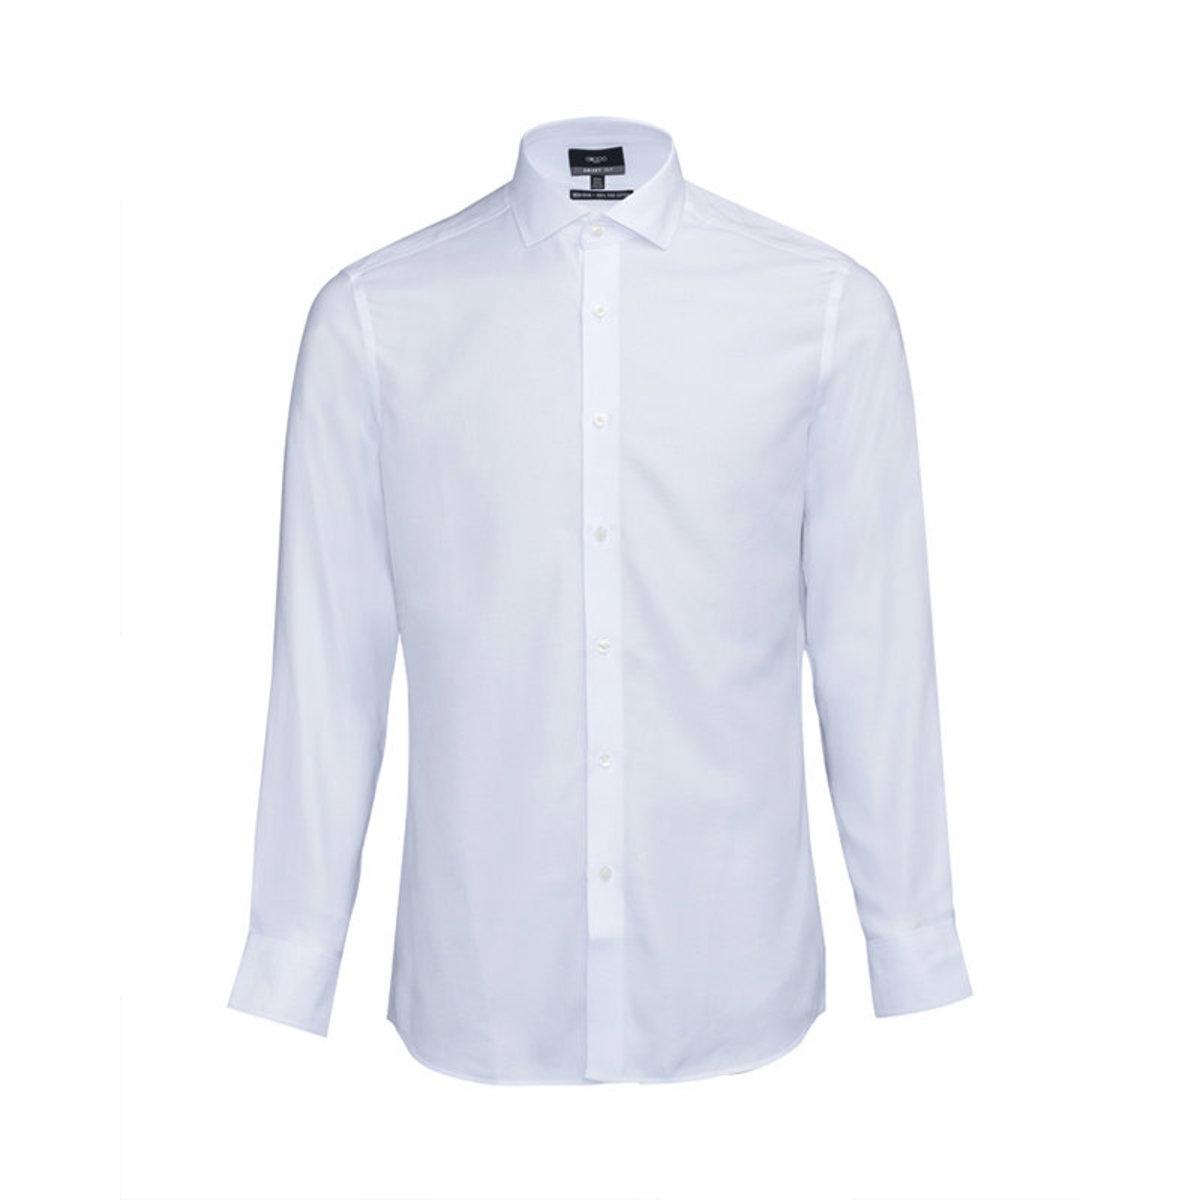 【Non-iron】Men's Fine Cotton Oxford Long Sleeve Shirt (White)